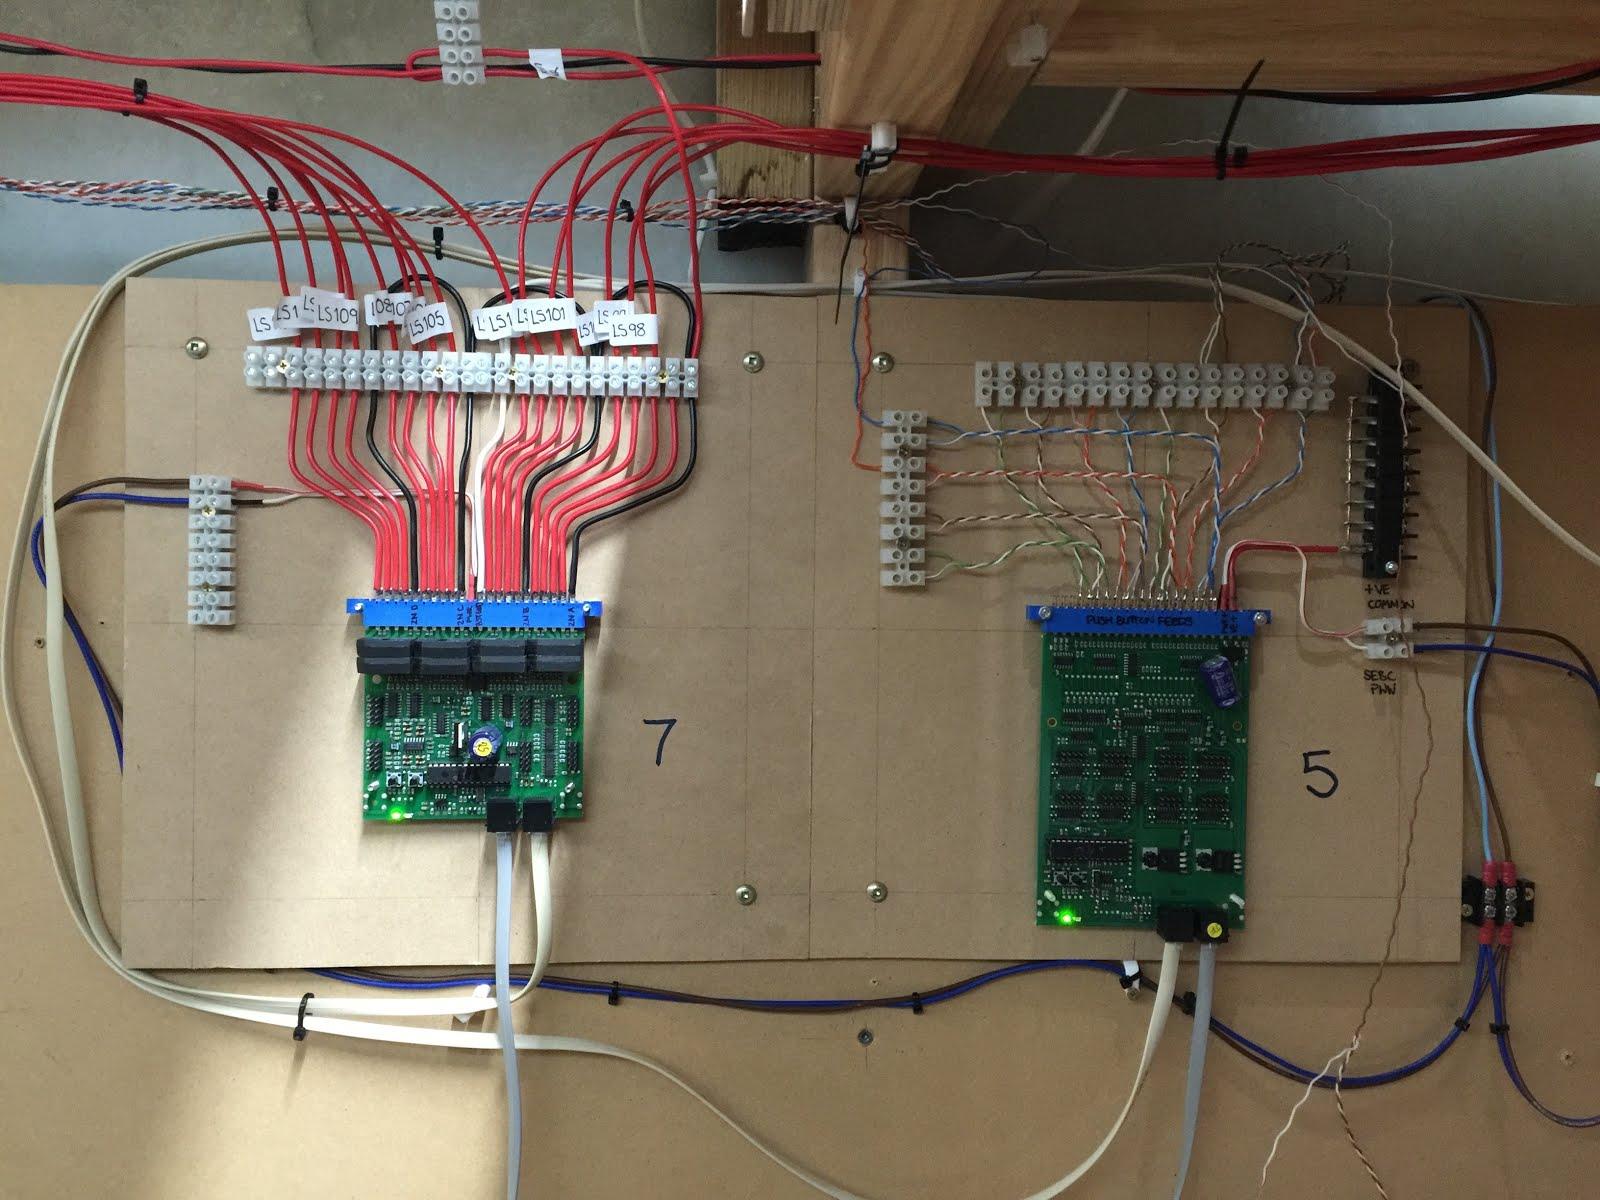 circuitron tortoise wiring diagram [ 1600 x 1200 Pixel ]